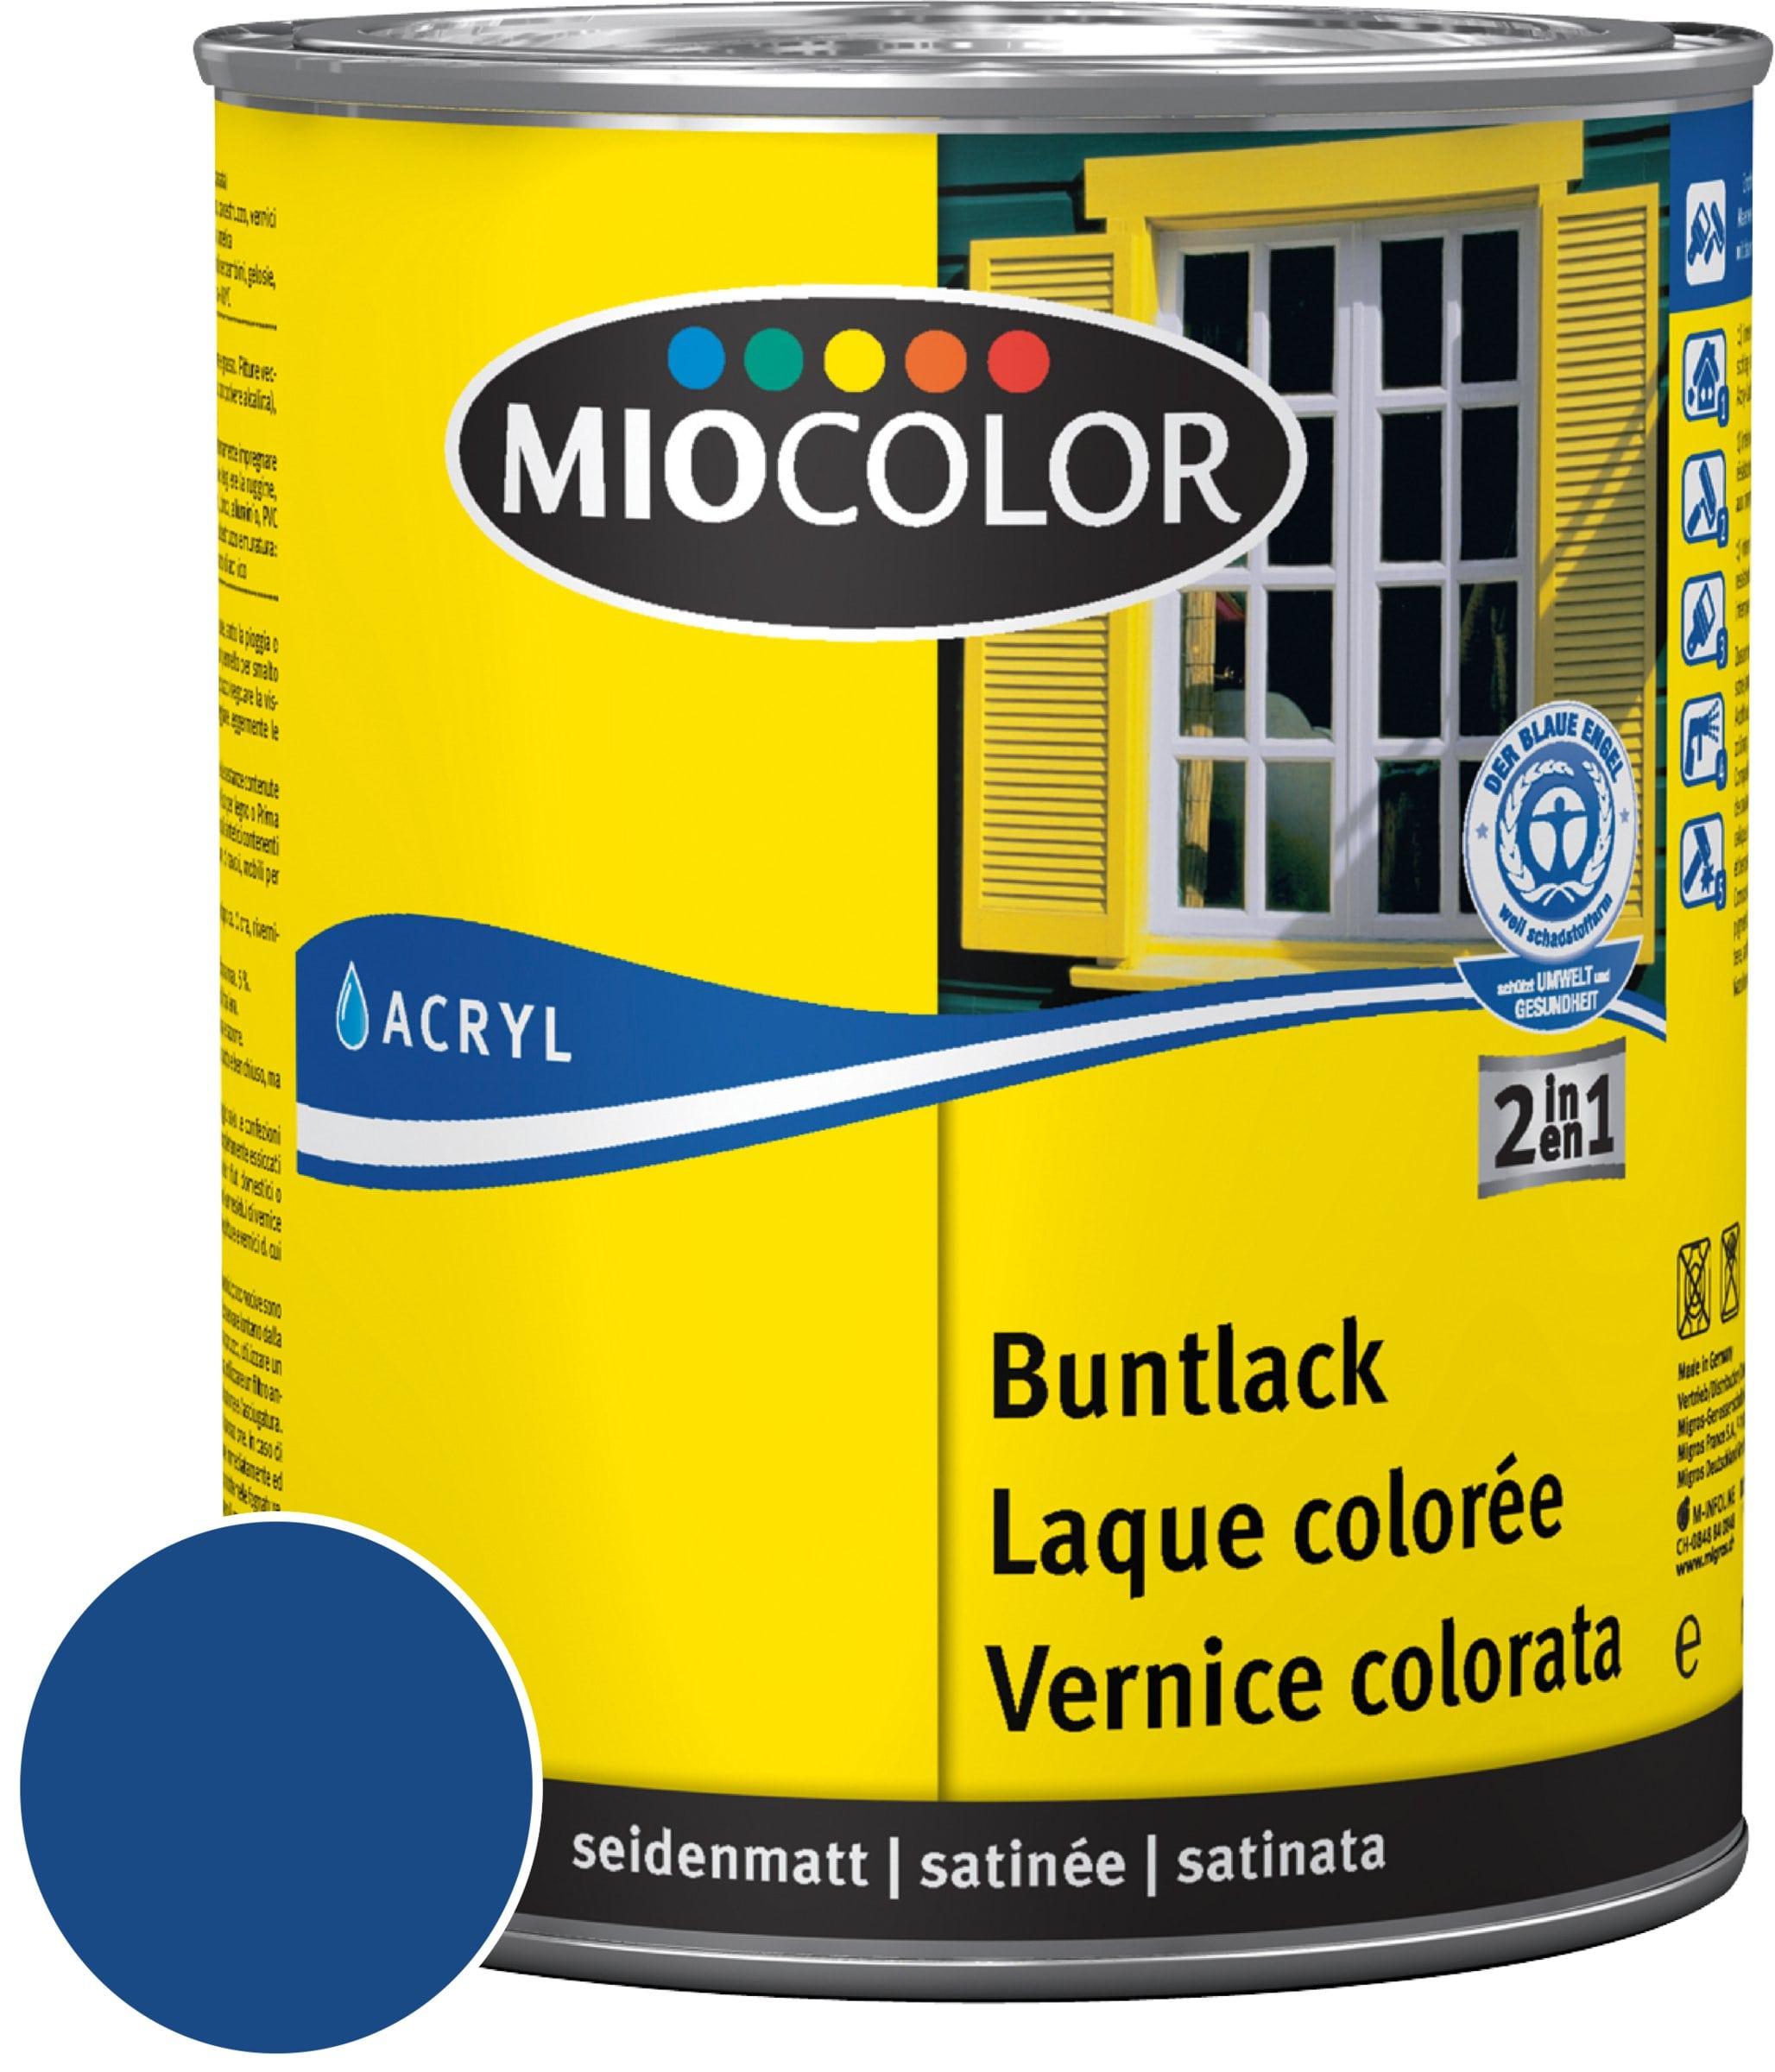 Miocolor Acryl Vernice colorata satinata Blu genziana 125 ml